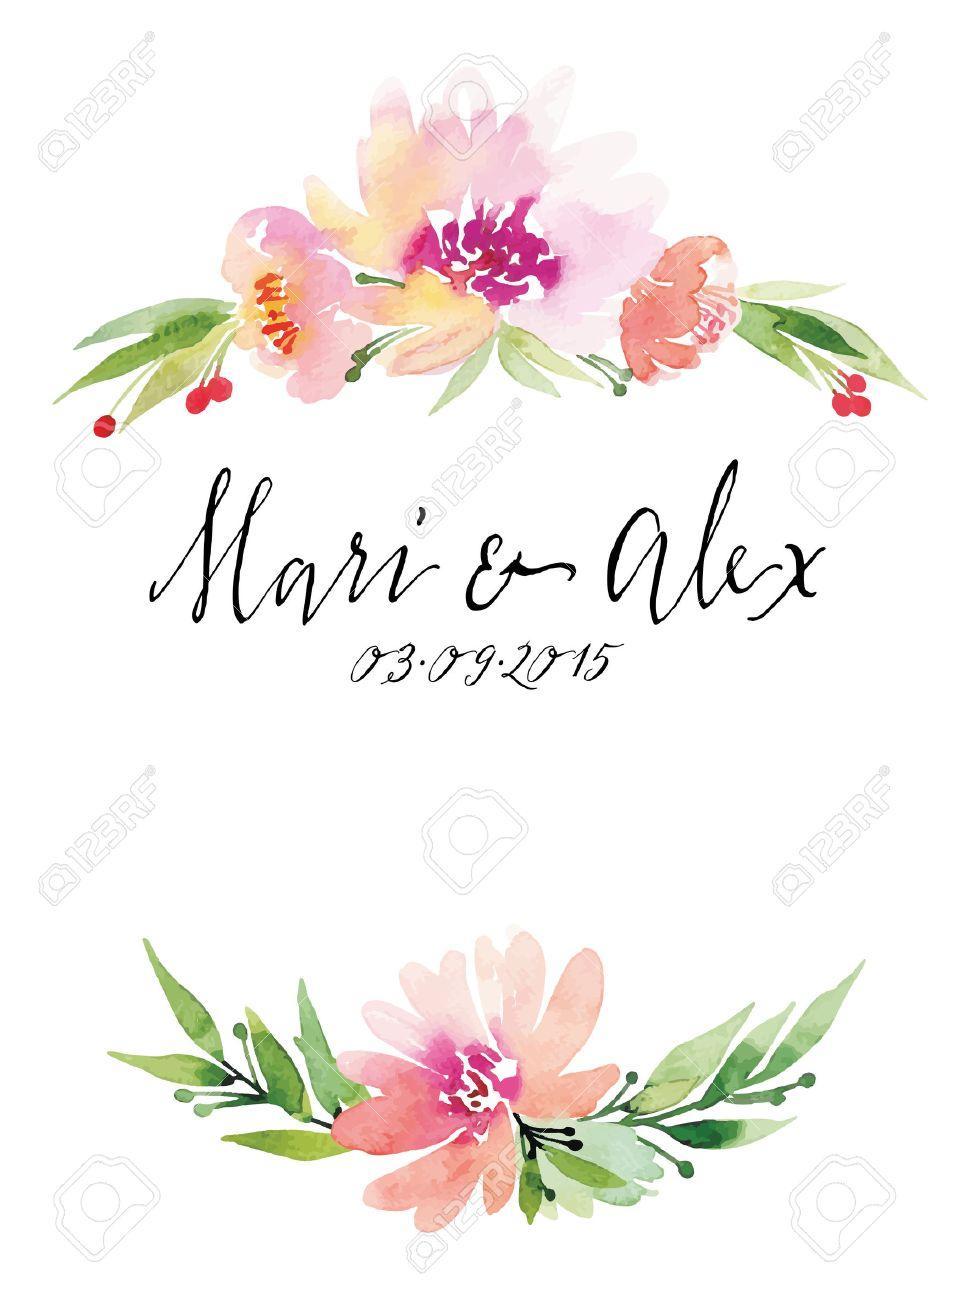 Watercolor greeting card flowers. Handmade. - 42524184